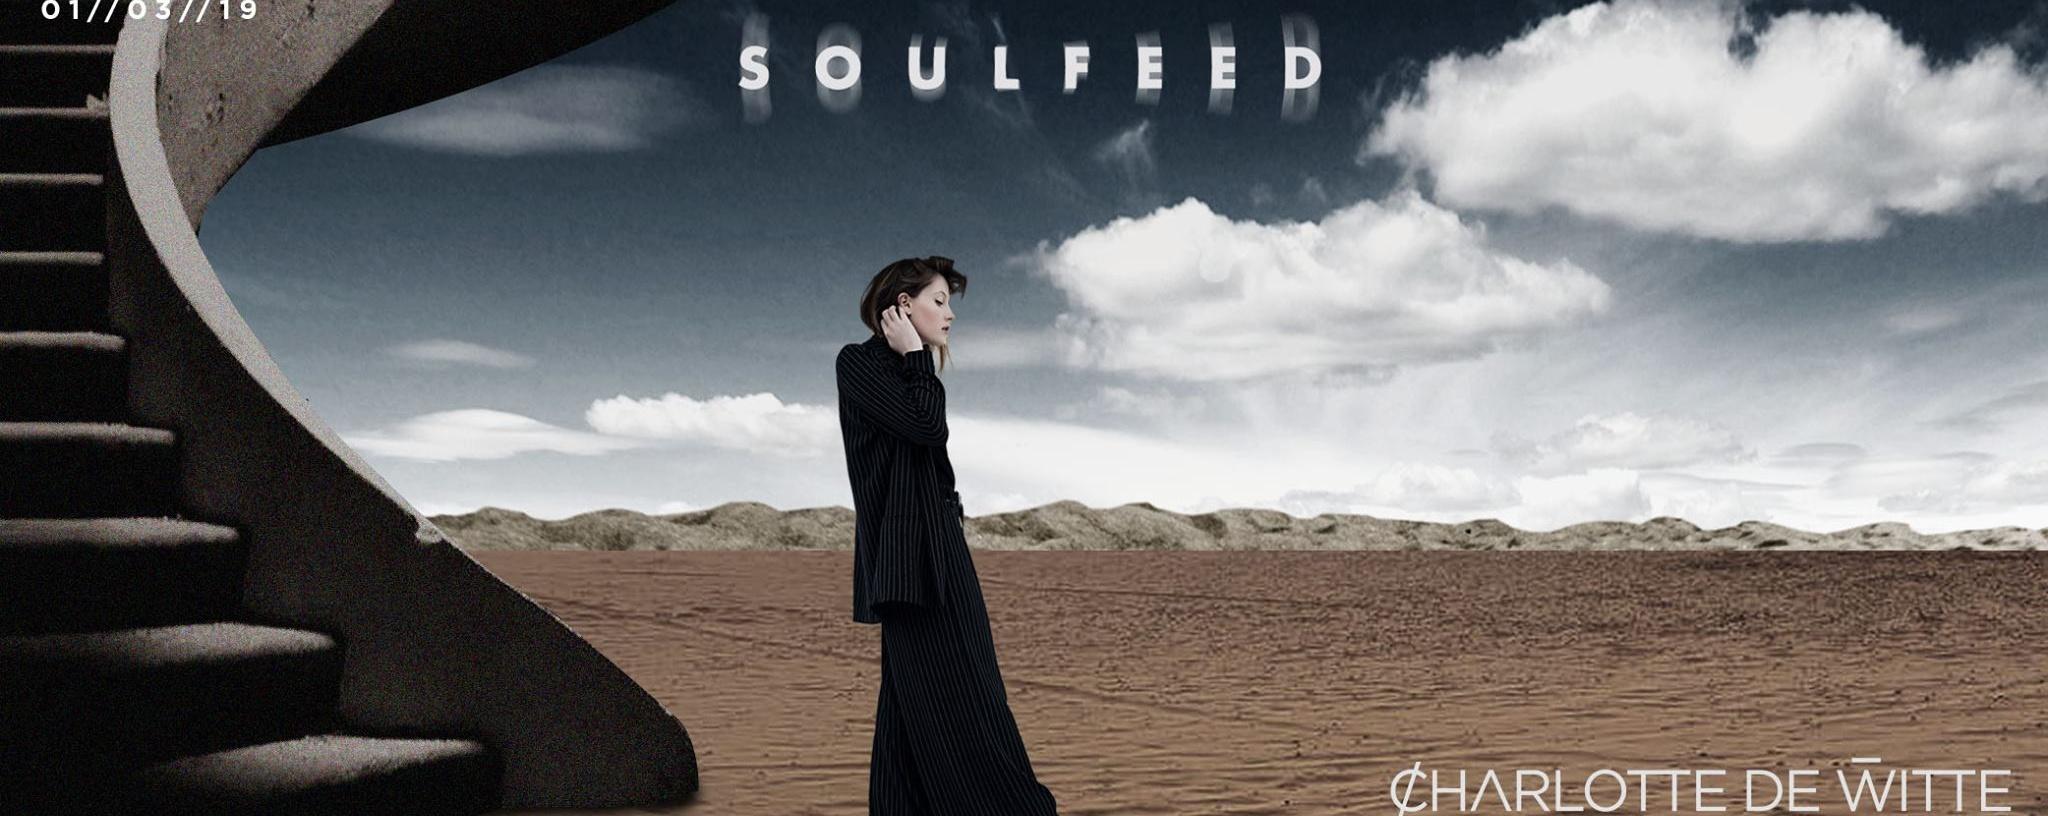 Soulfeed Presents Charlotte de Witte